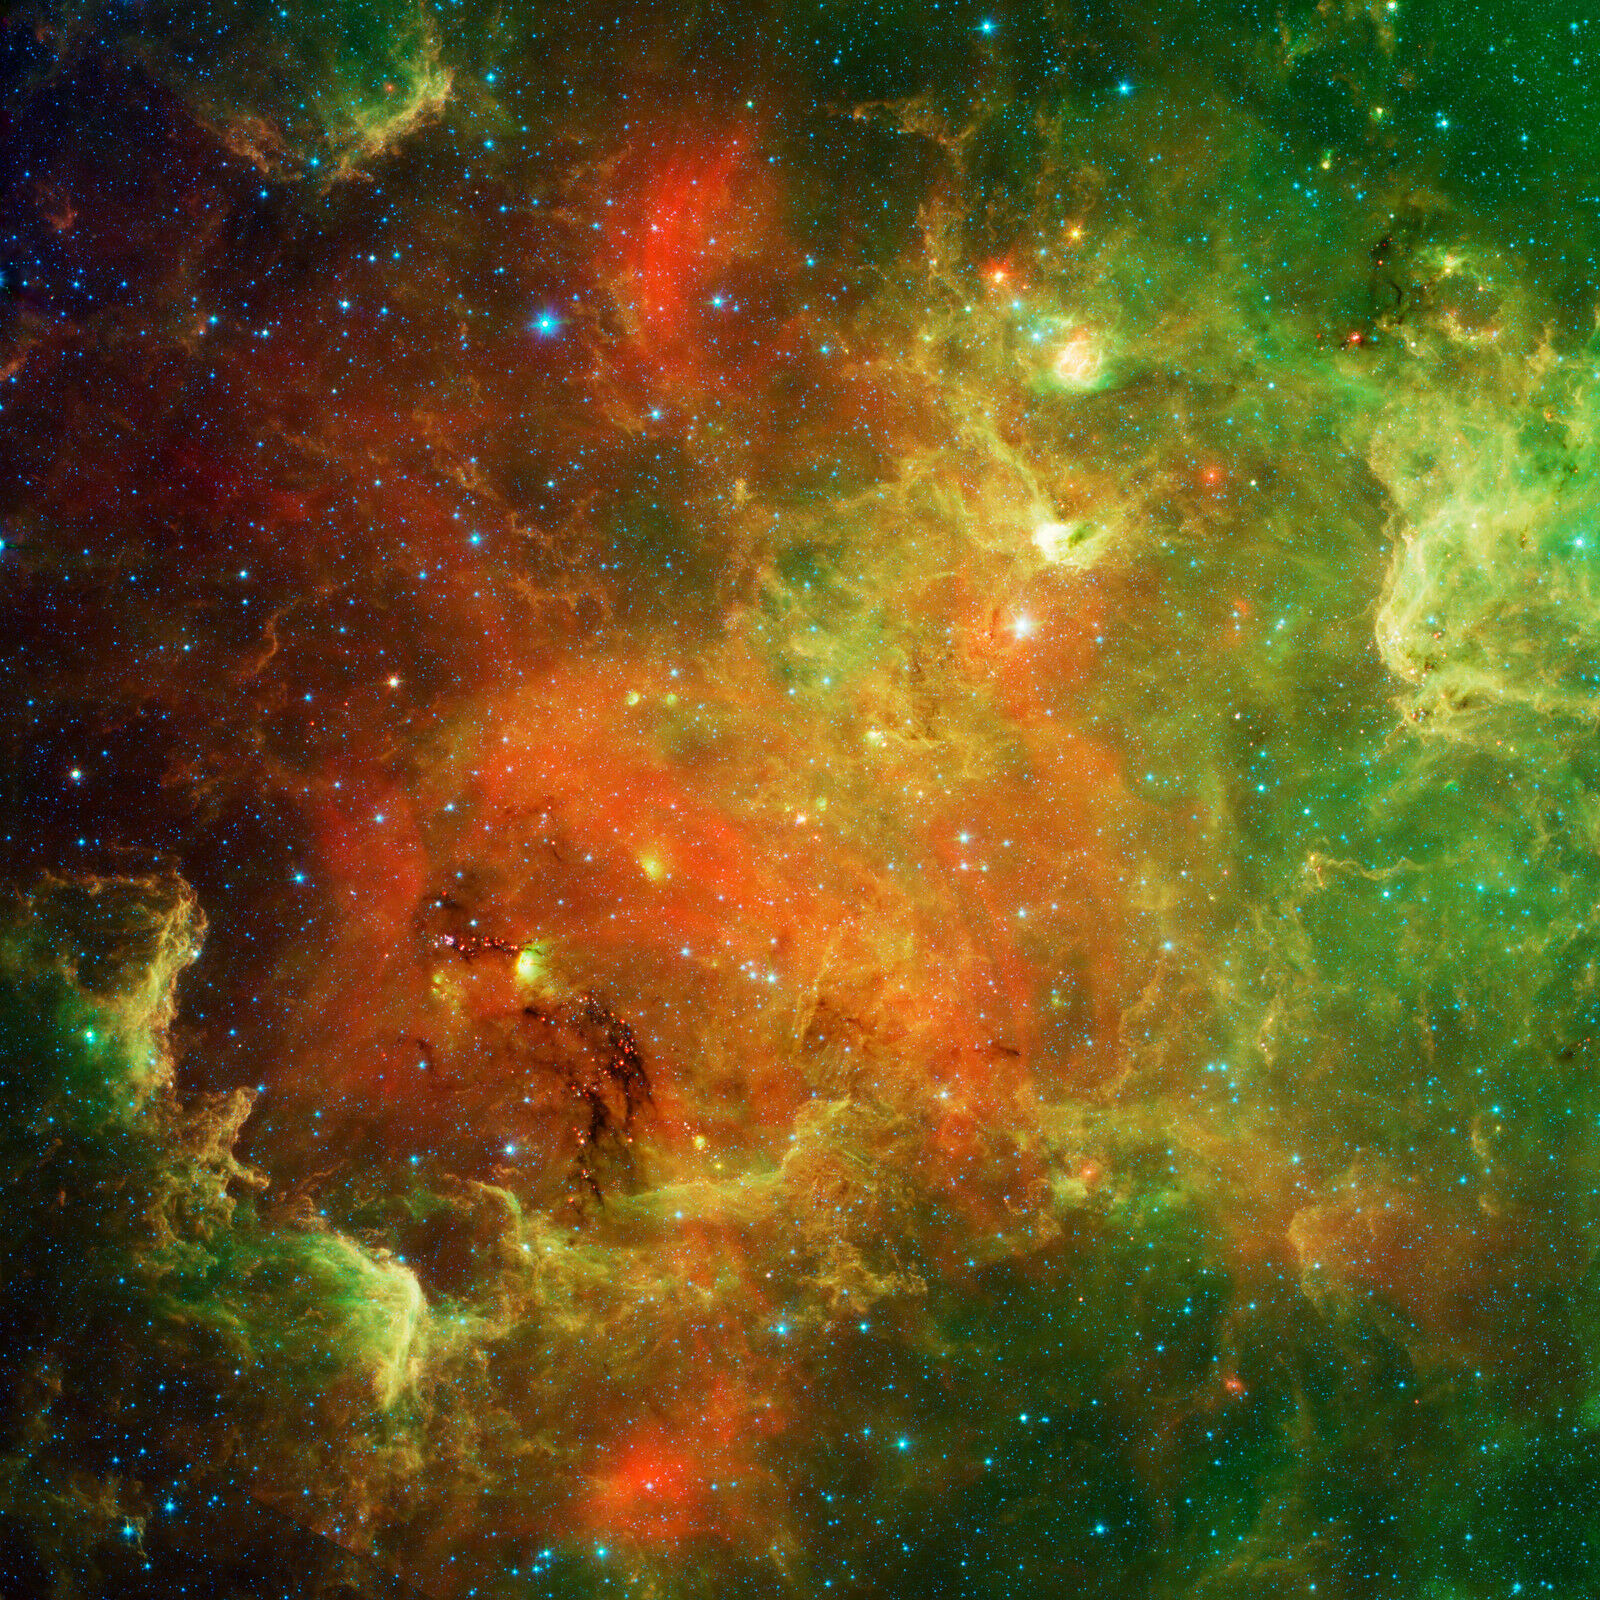 North America nebula Spitzer Hubble JPL NASA space telescope photo PIA13844